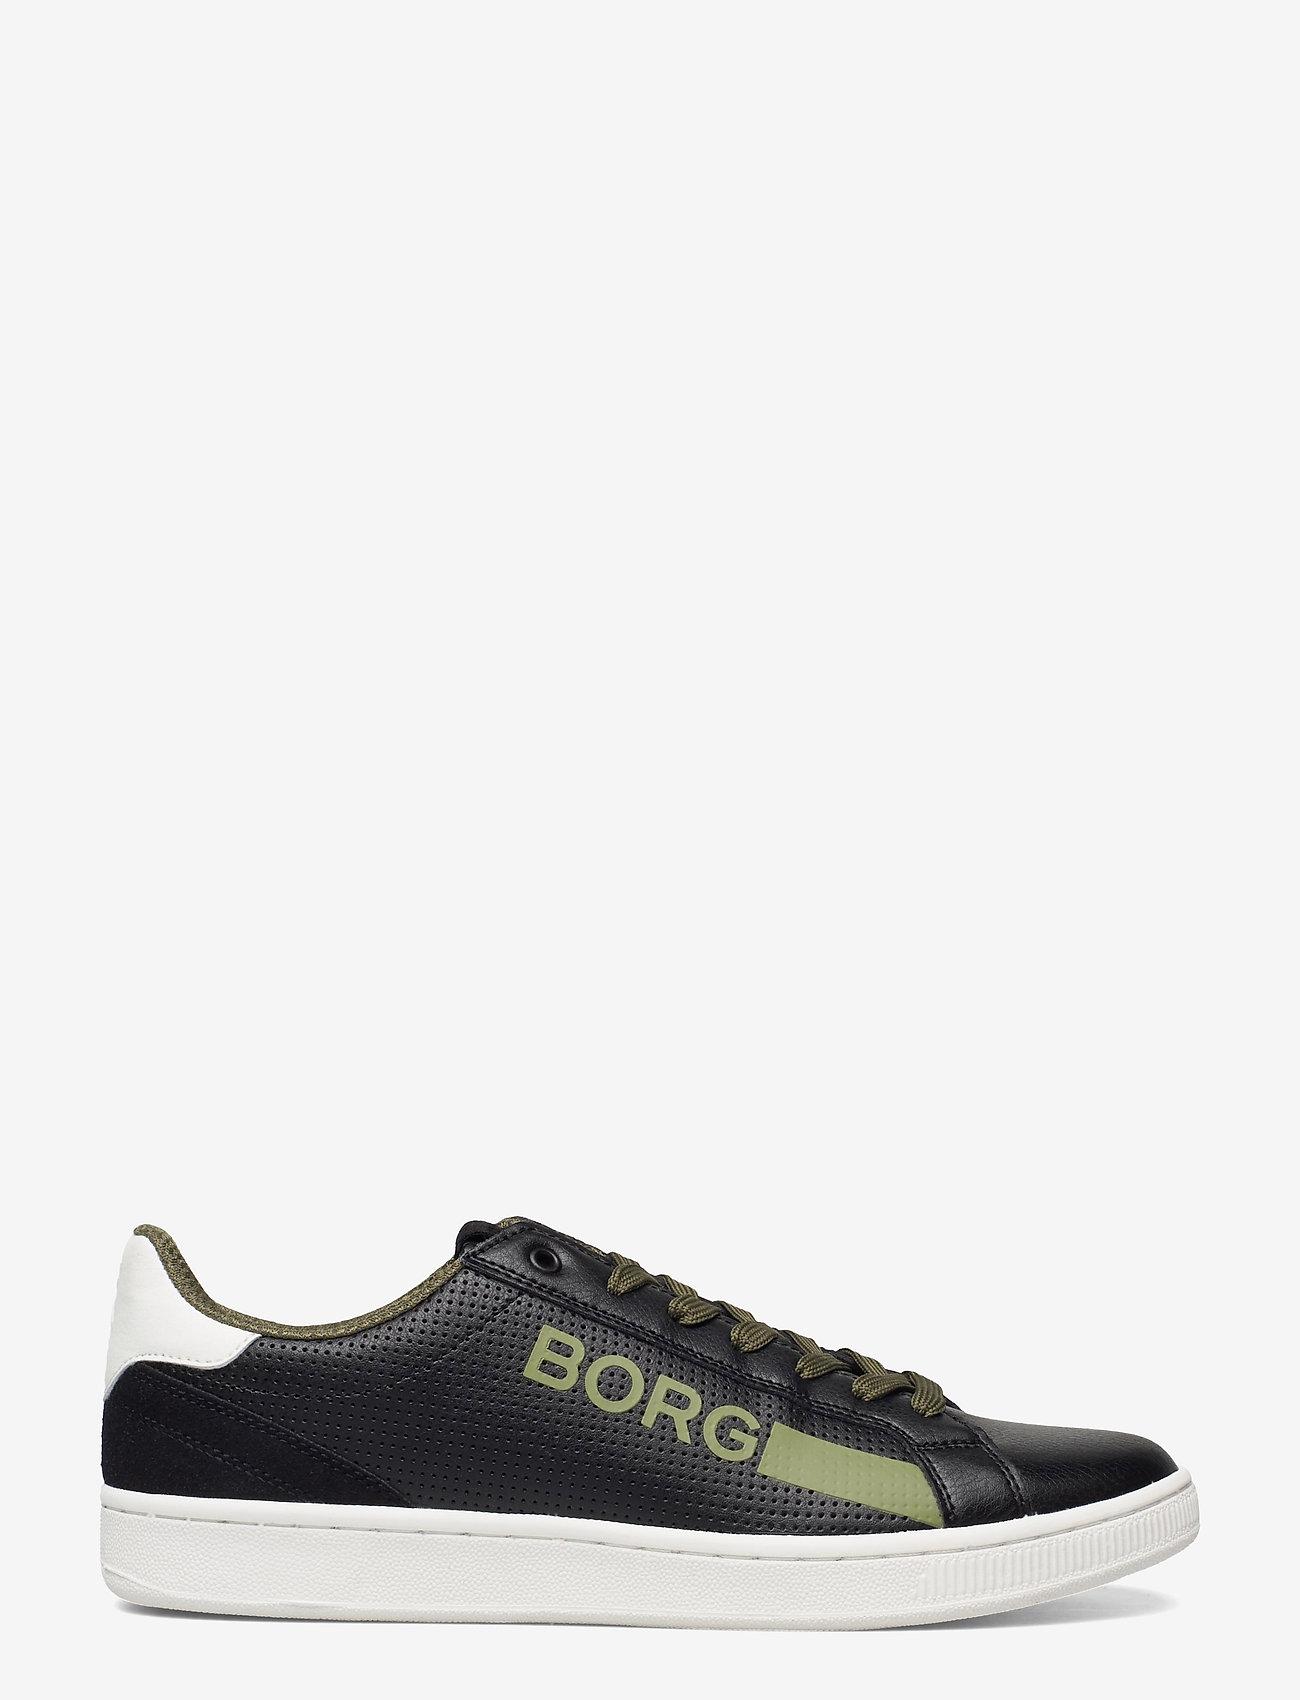 Björn Borg - T330 Low Ctr Prf M - laag sneakers - black-white - 1